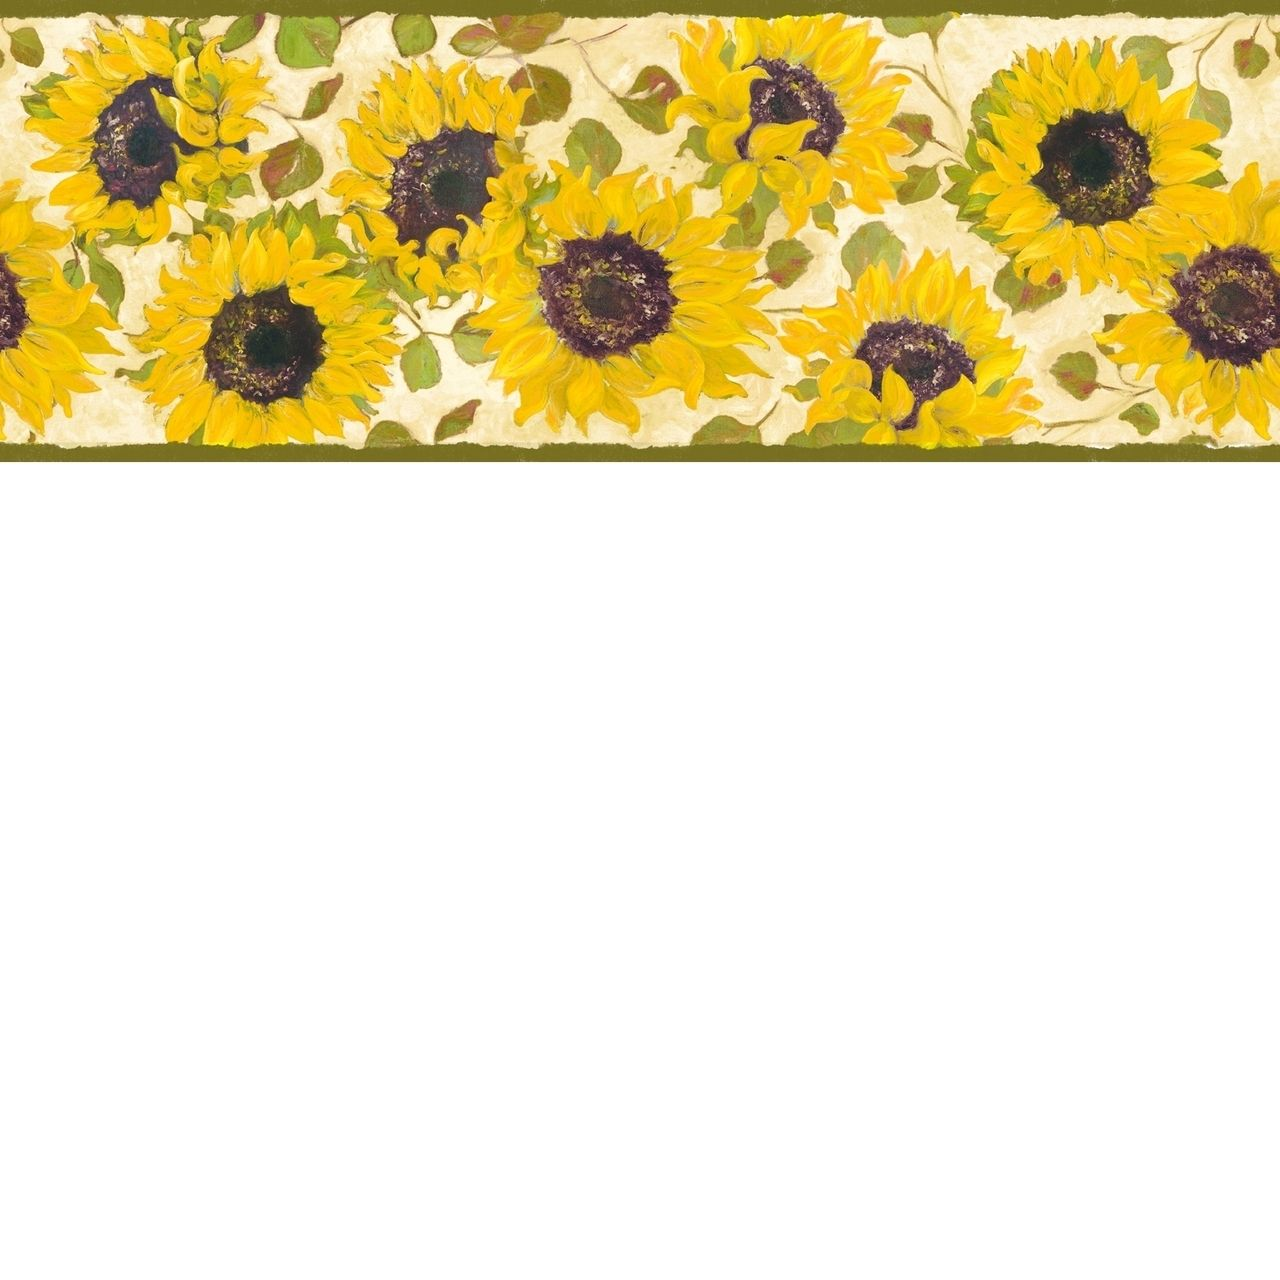 Pin by Gayla Graven on Wallpaper Borders Sunflower wallpaper 1280x1280